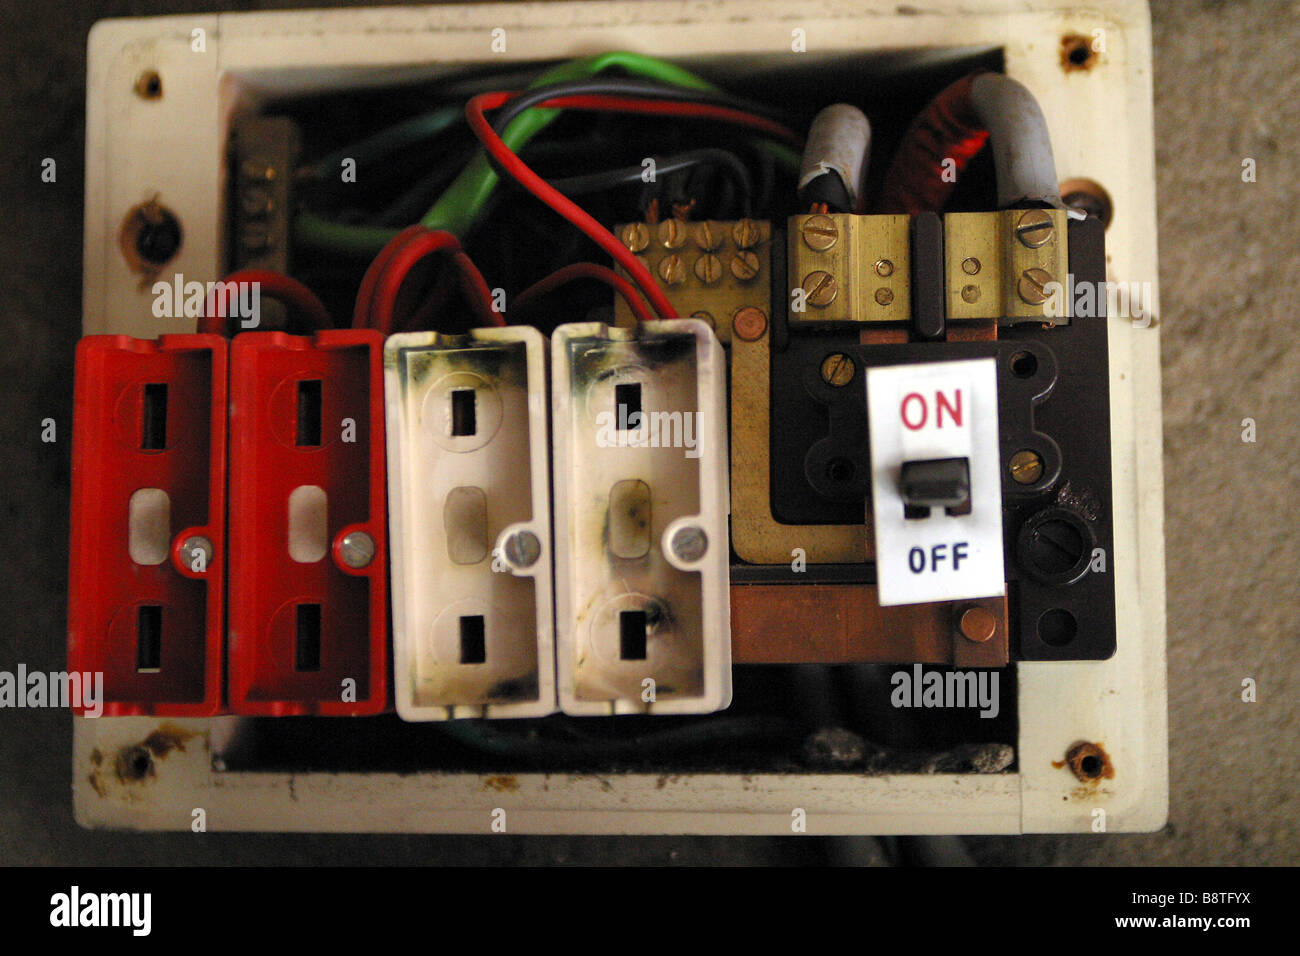 Switch Wiring Uk Free Download Wiring Diagrams Pictures Wiring